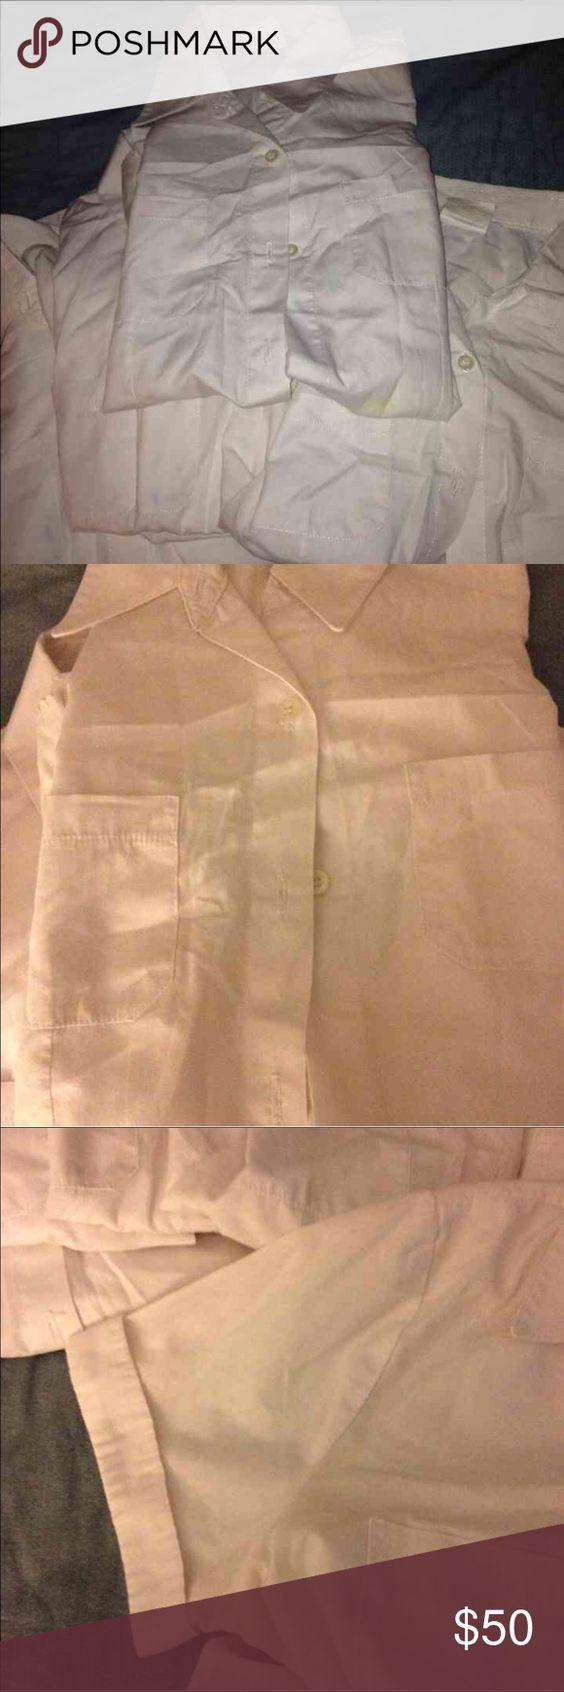 🚌 Back to School Uniform Shirt Pack 🚌 Dennis Uniform - Set of 5 girls white uniform shirts. Two pockets. Short sleeves. Dennis Uniform Shirts & Tops Blouses